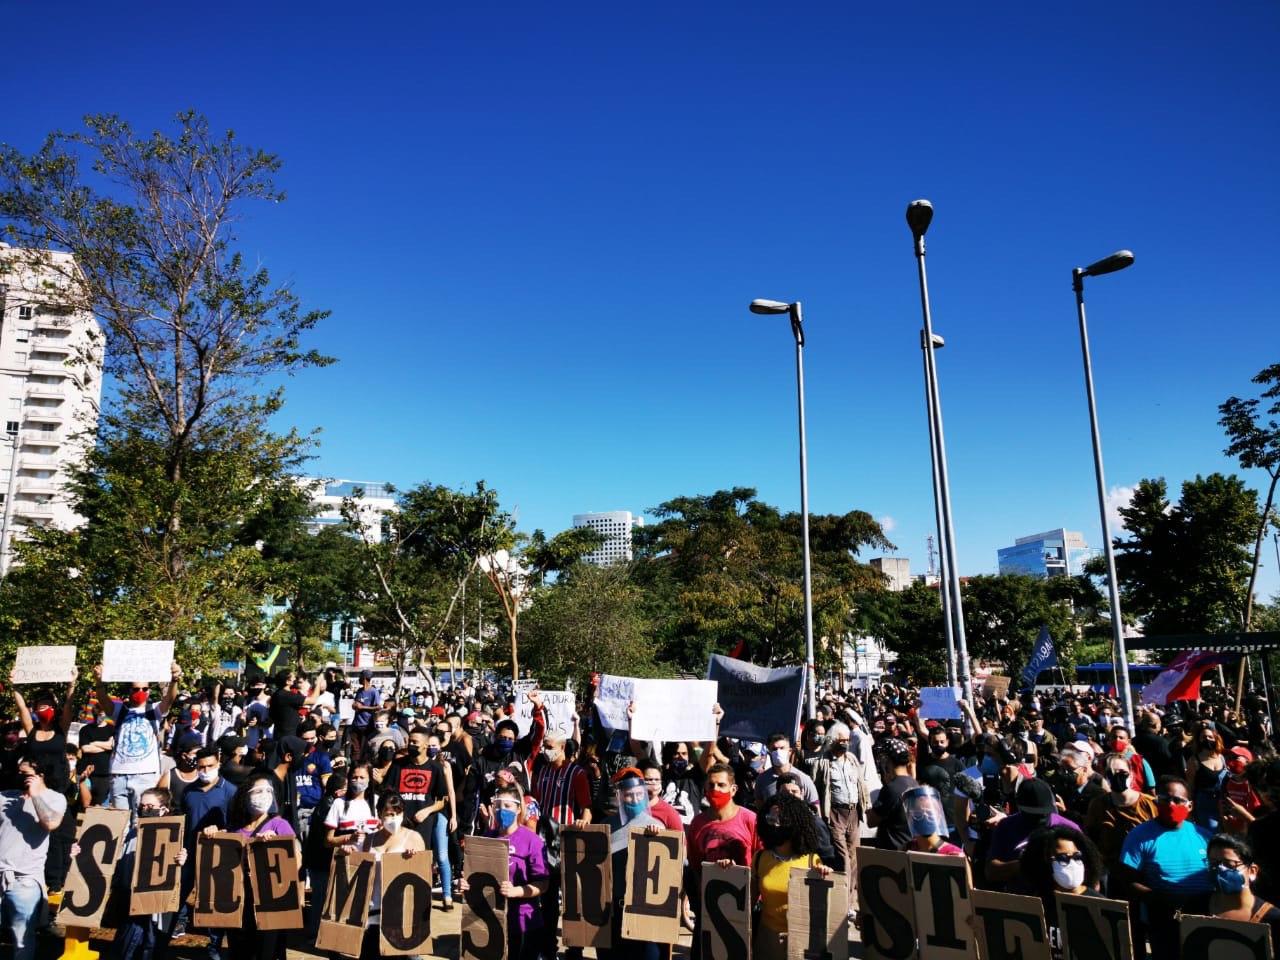 https://veja.abril.com.br/wp-content/uploads/2020/06/largo-da-batata-protesto.jpg